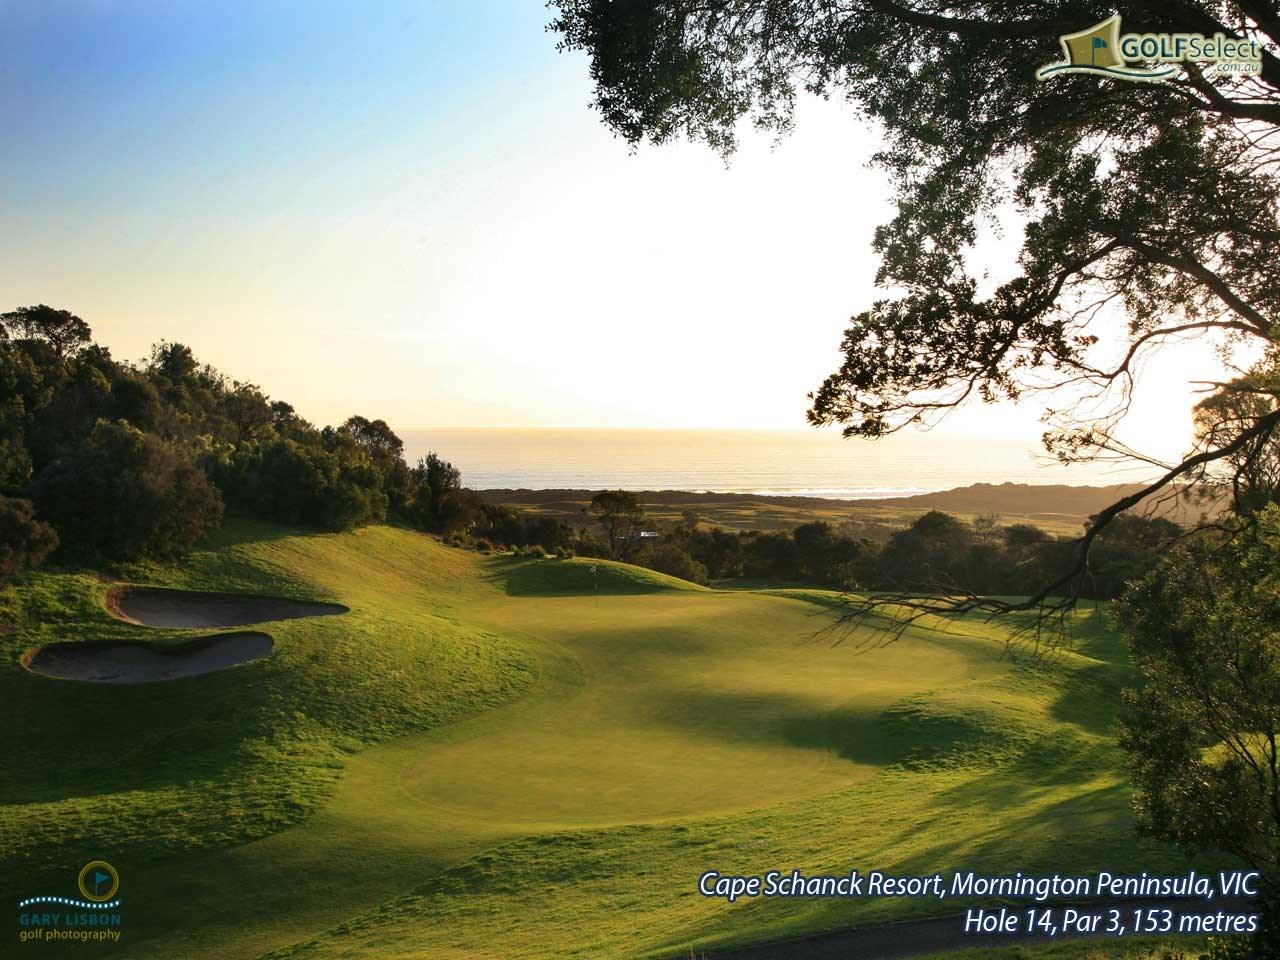 golfselect golf wallpaper racv cape schanck resort. Black Bedroom Furniture Sets. Home Design Ideas